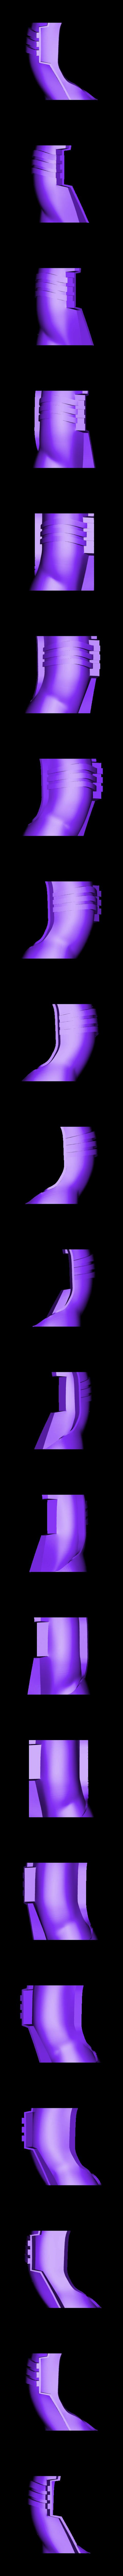 Part 8 v3.stl Download free STL file Clone Trooper Helmet Phase 2 Star Wars • 3D printable template, VillainousPropShop